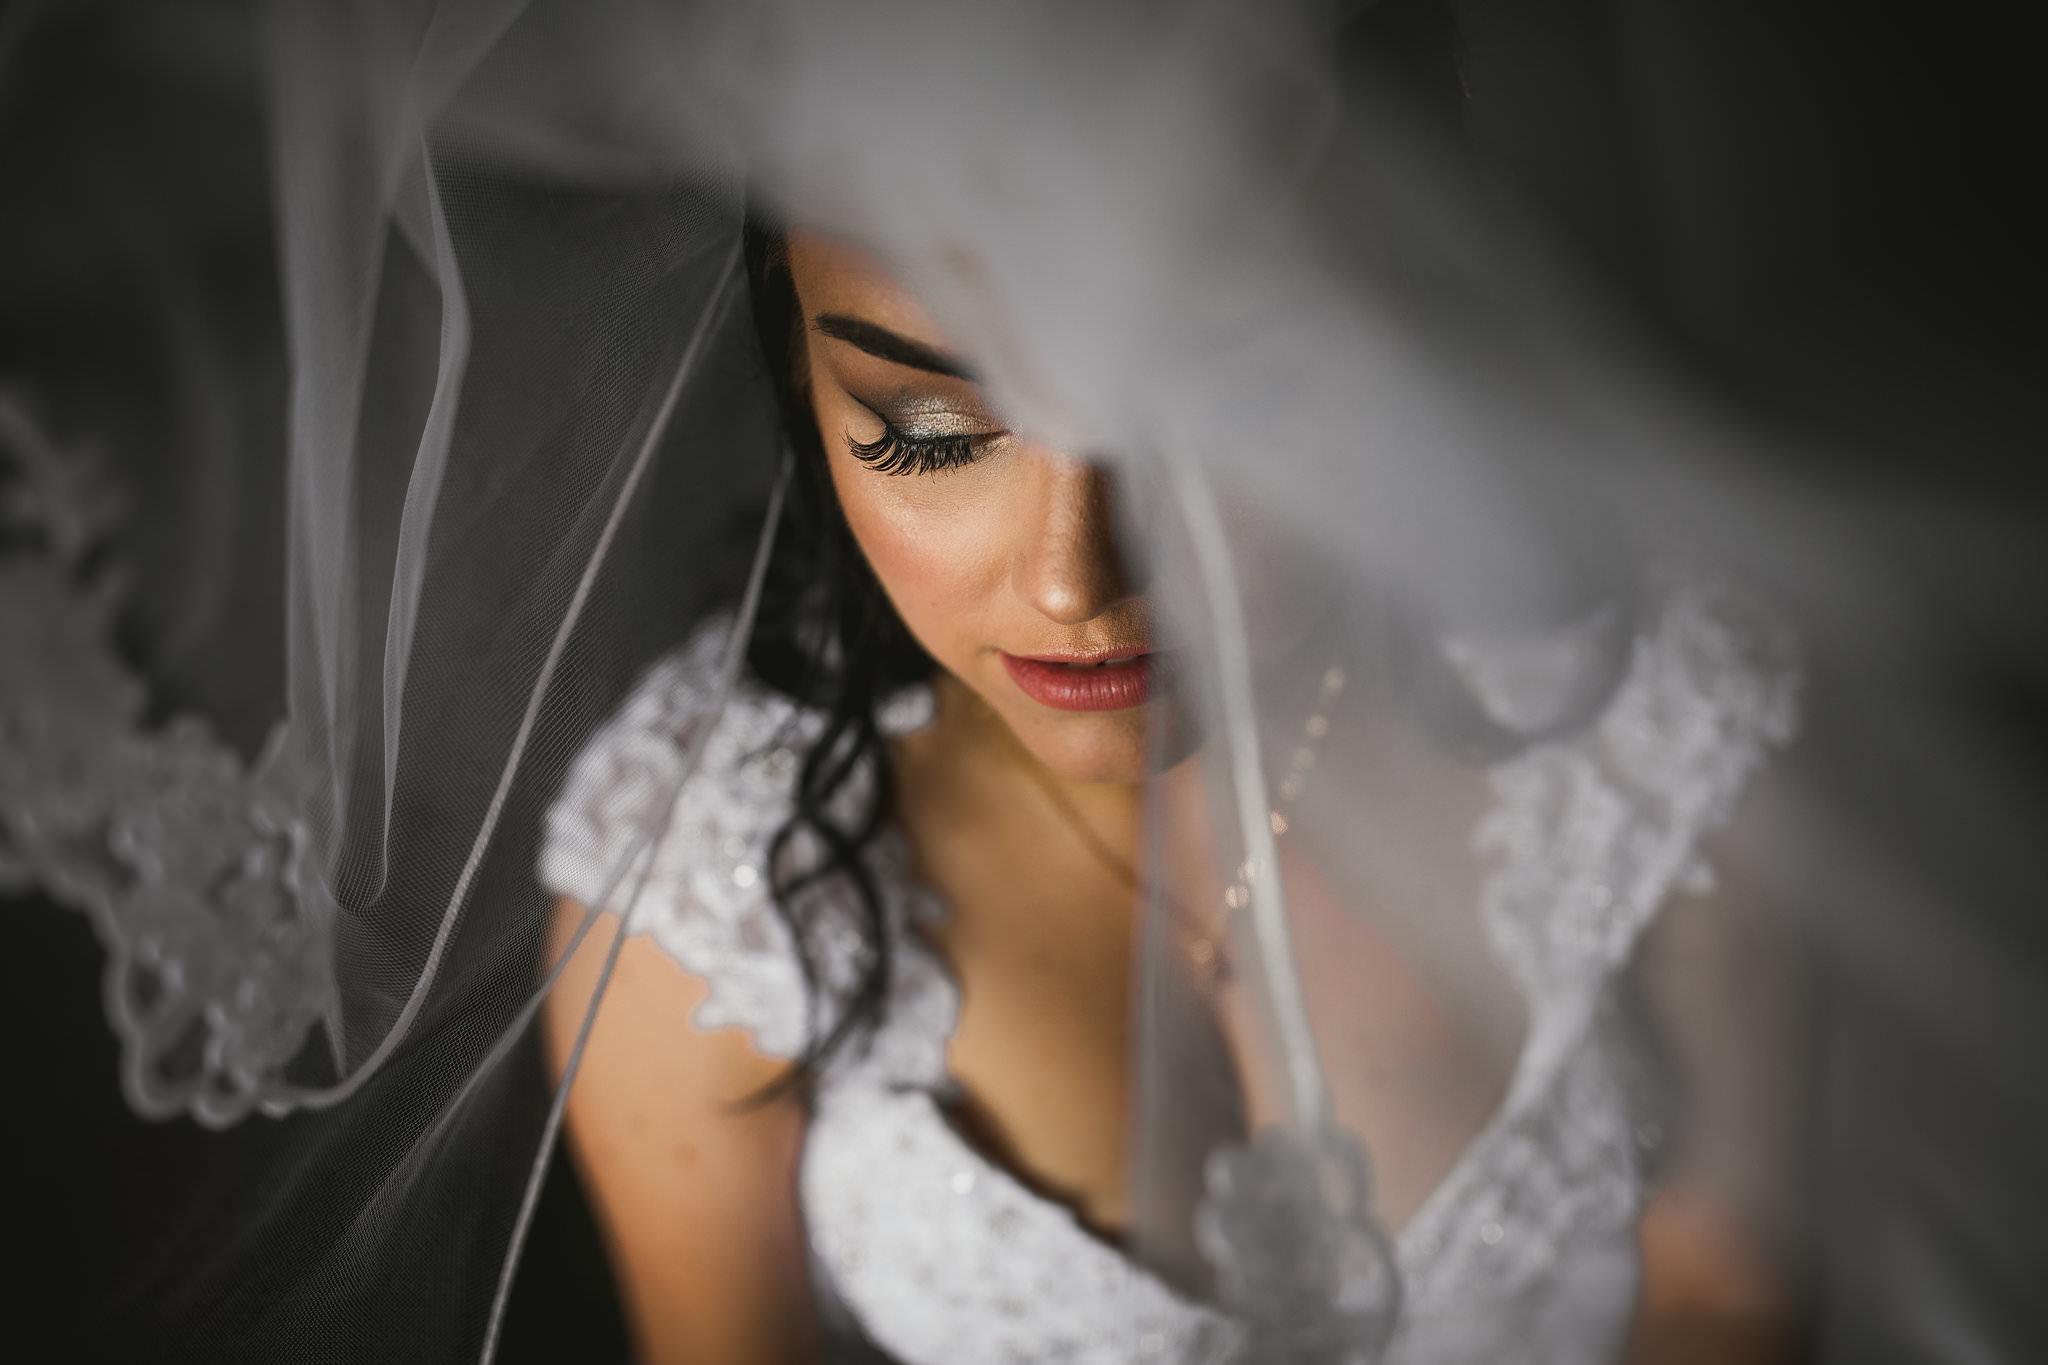 Kristen Adam Kindred Loft Whitby Wedding Photos 74 - Durham Wedding Photographer: Kindred Loft Wedding Photos